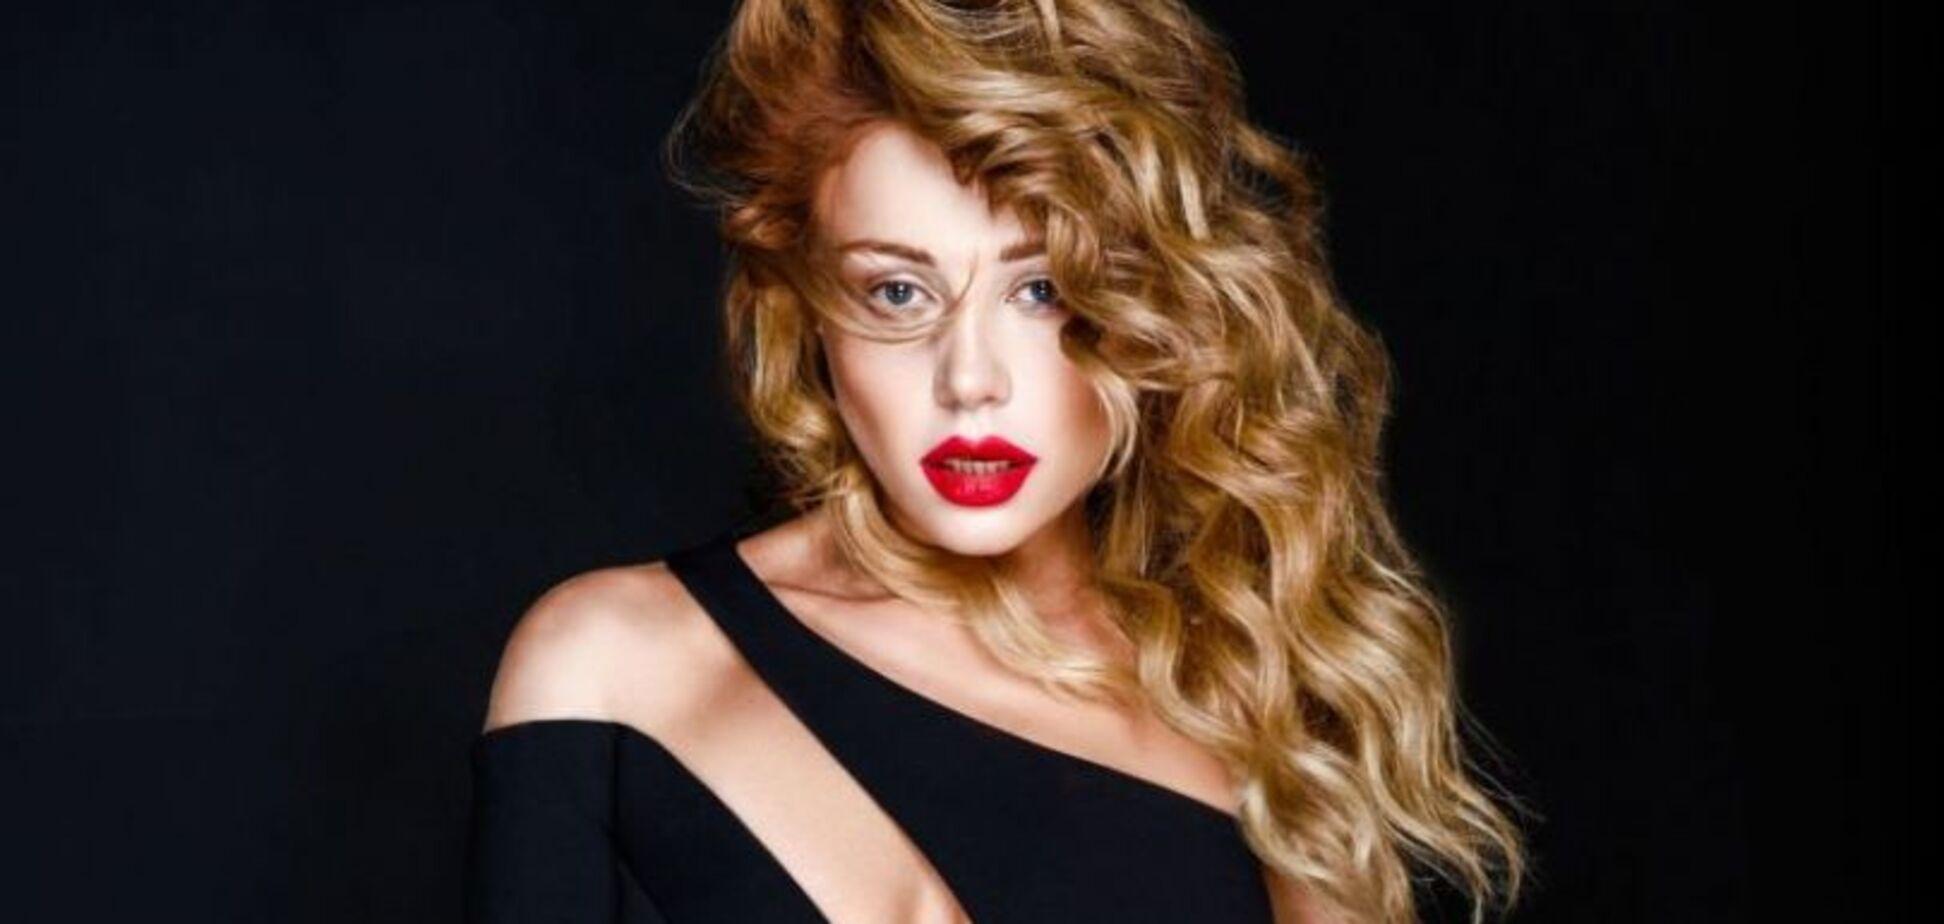 'Танці з зірками-2018': Тина Кароль вышла на публику в откровенном платье